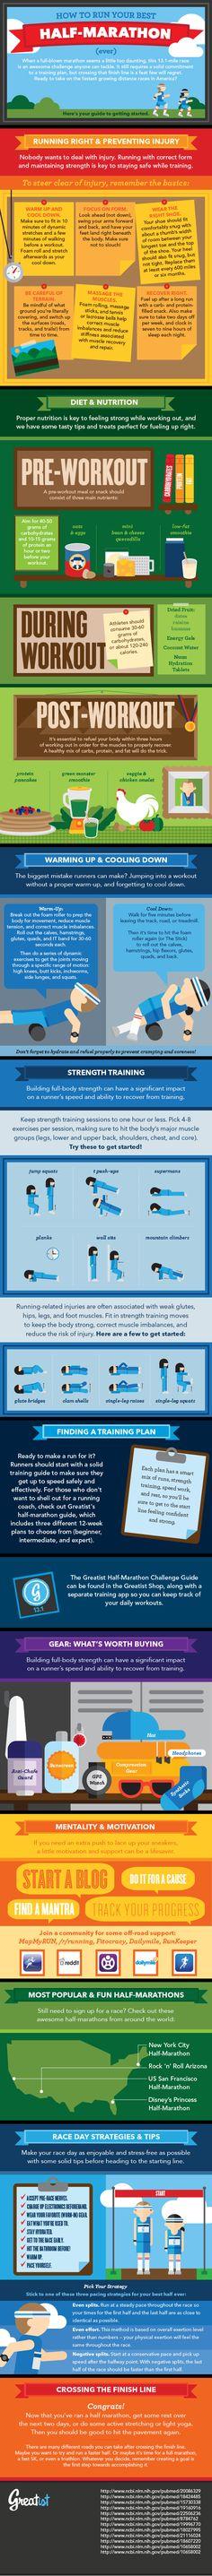 Smart tips for running a half marathon.